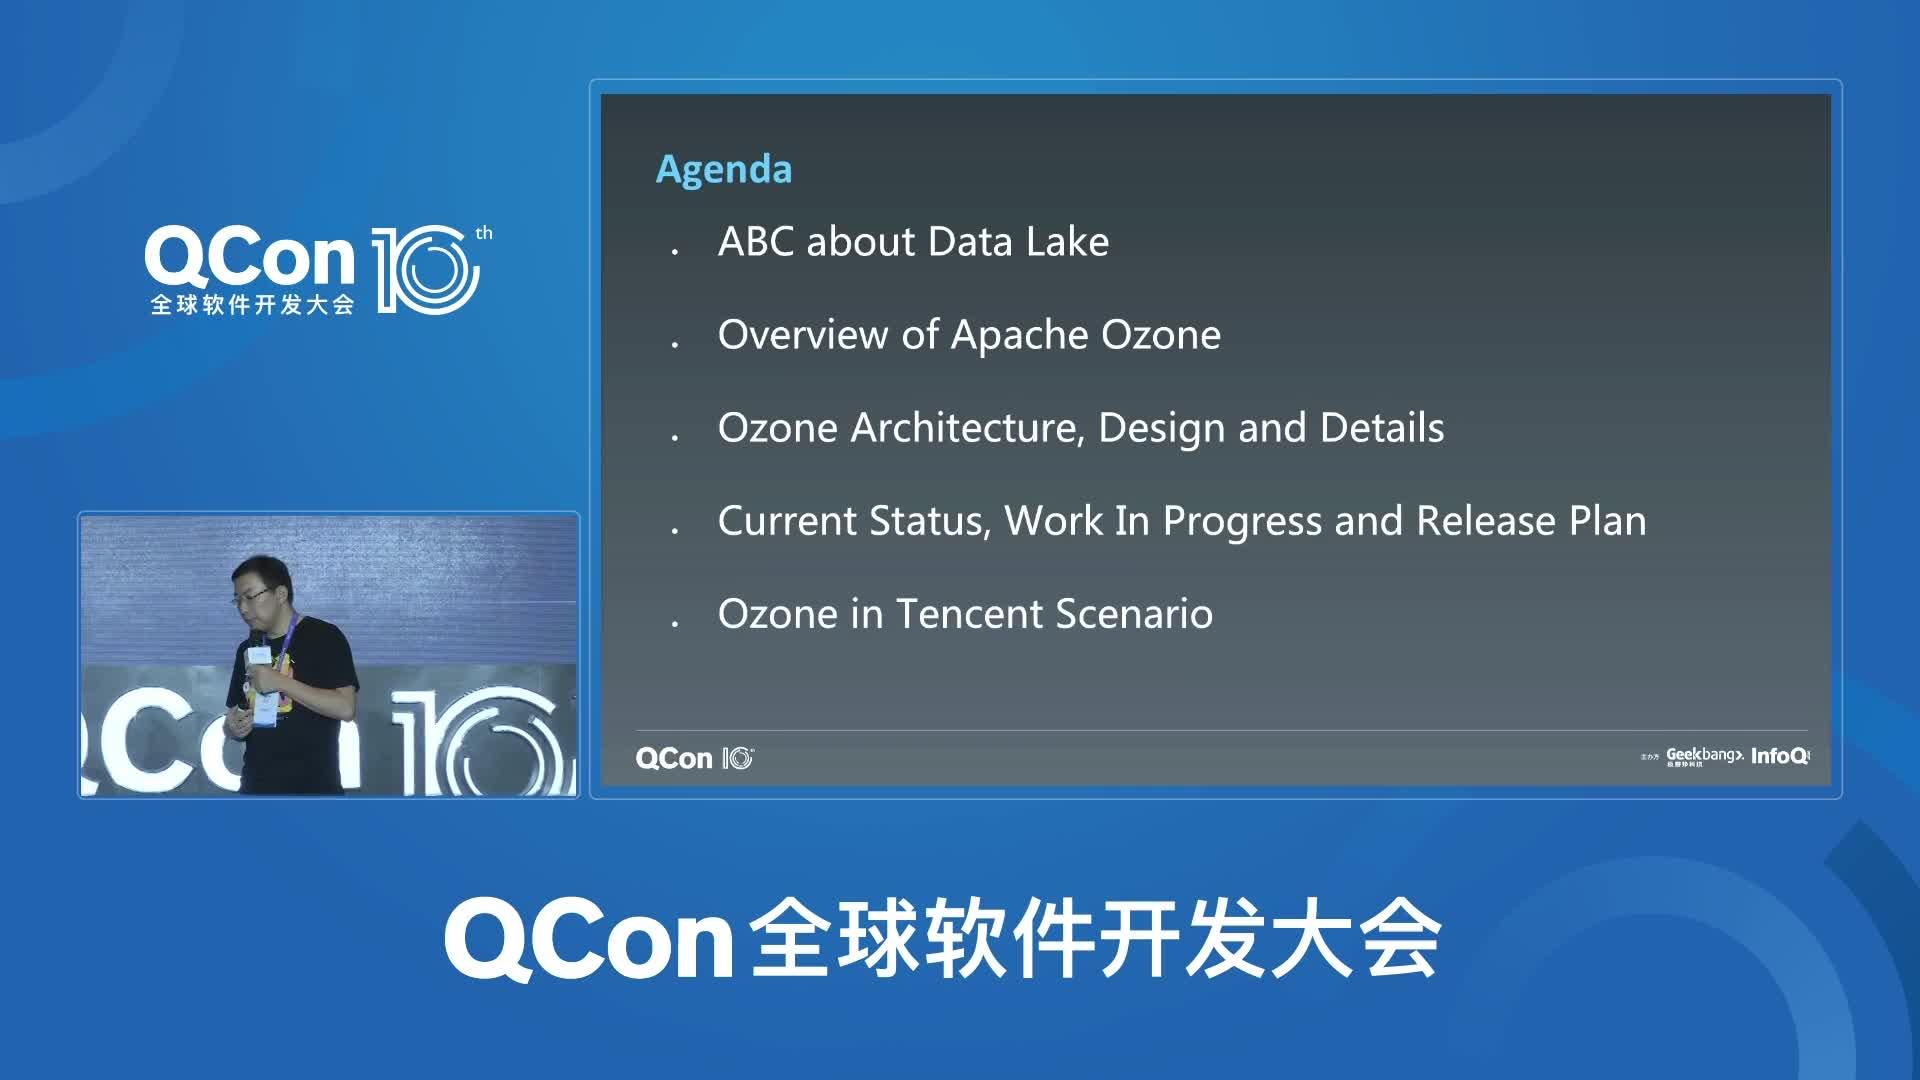 OZone - 下一代数据湖存储丨QCon